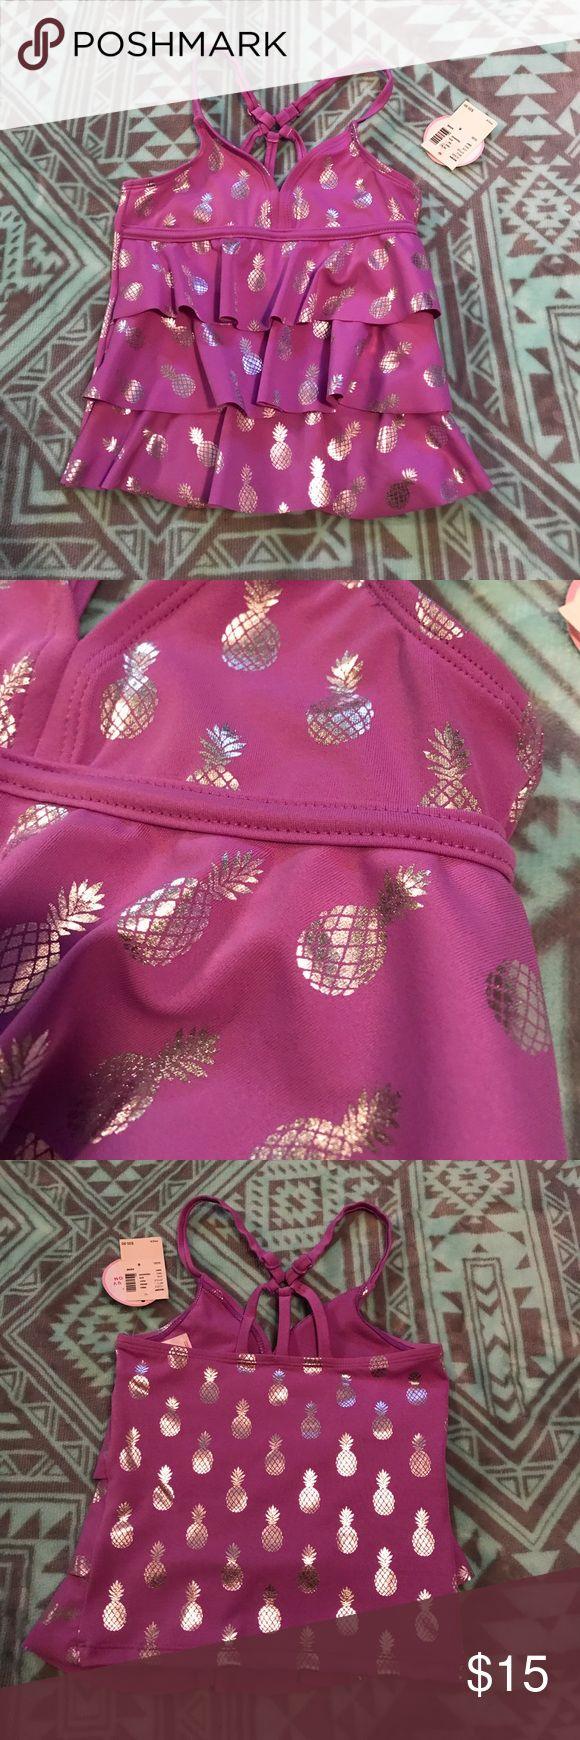 New Girls Gymboree Pineapple Tankini Swim Suit Top Brand new with tags ($35.90) Gymboree light purple with silver foil pineapples tankini swim suit top. Size 6. Gymboree Swim Bikinis